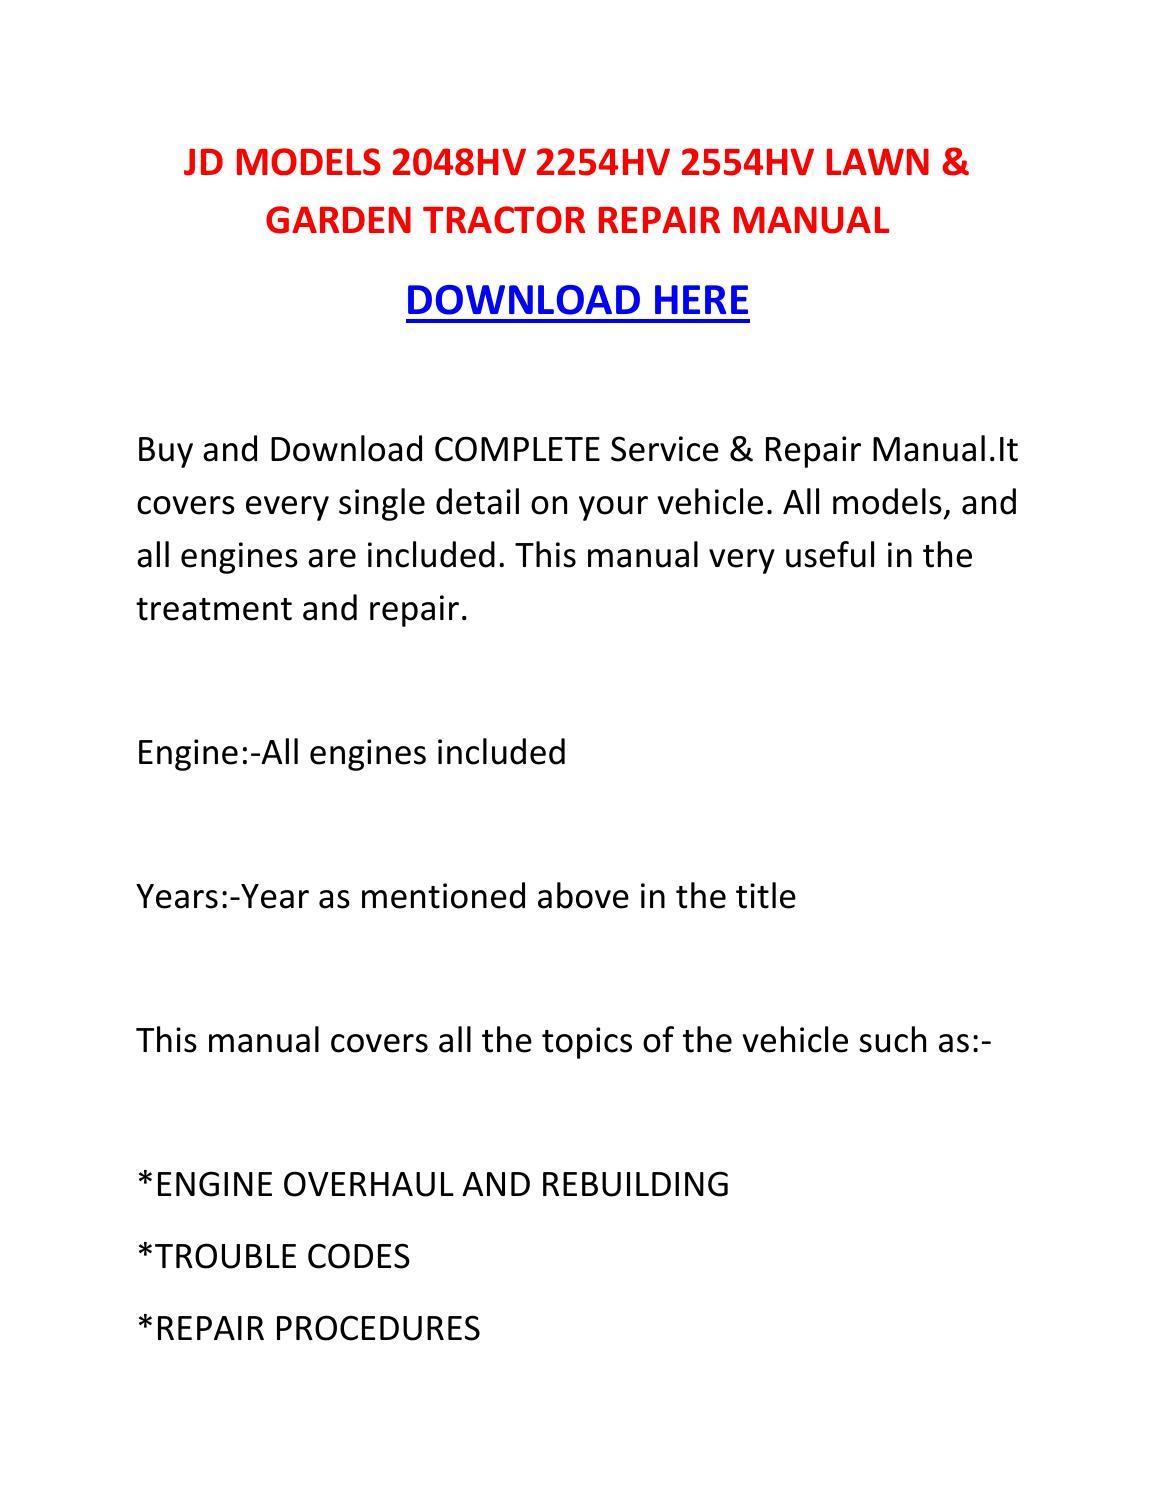 Jd    models 2048hv 2254hv 2554hv lawn   garden tractor repair manual by nikolairacioppiytk  Issuu